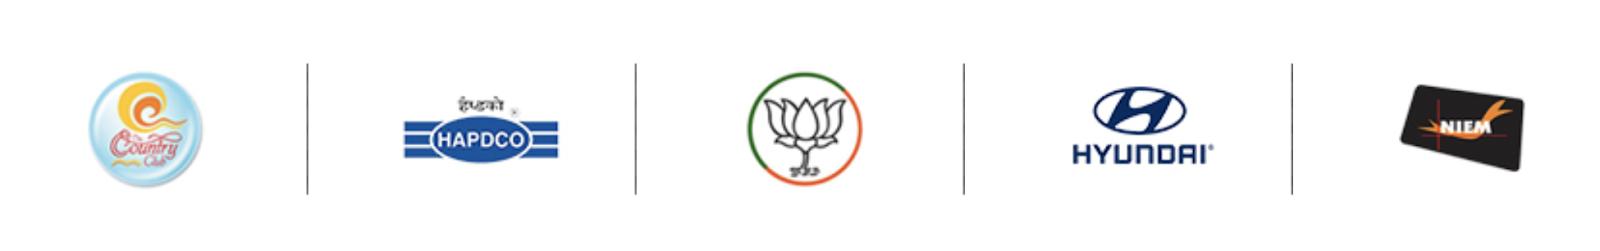 Digital Jugglers Clients - Digital Marketing Agencies in Lucknow